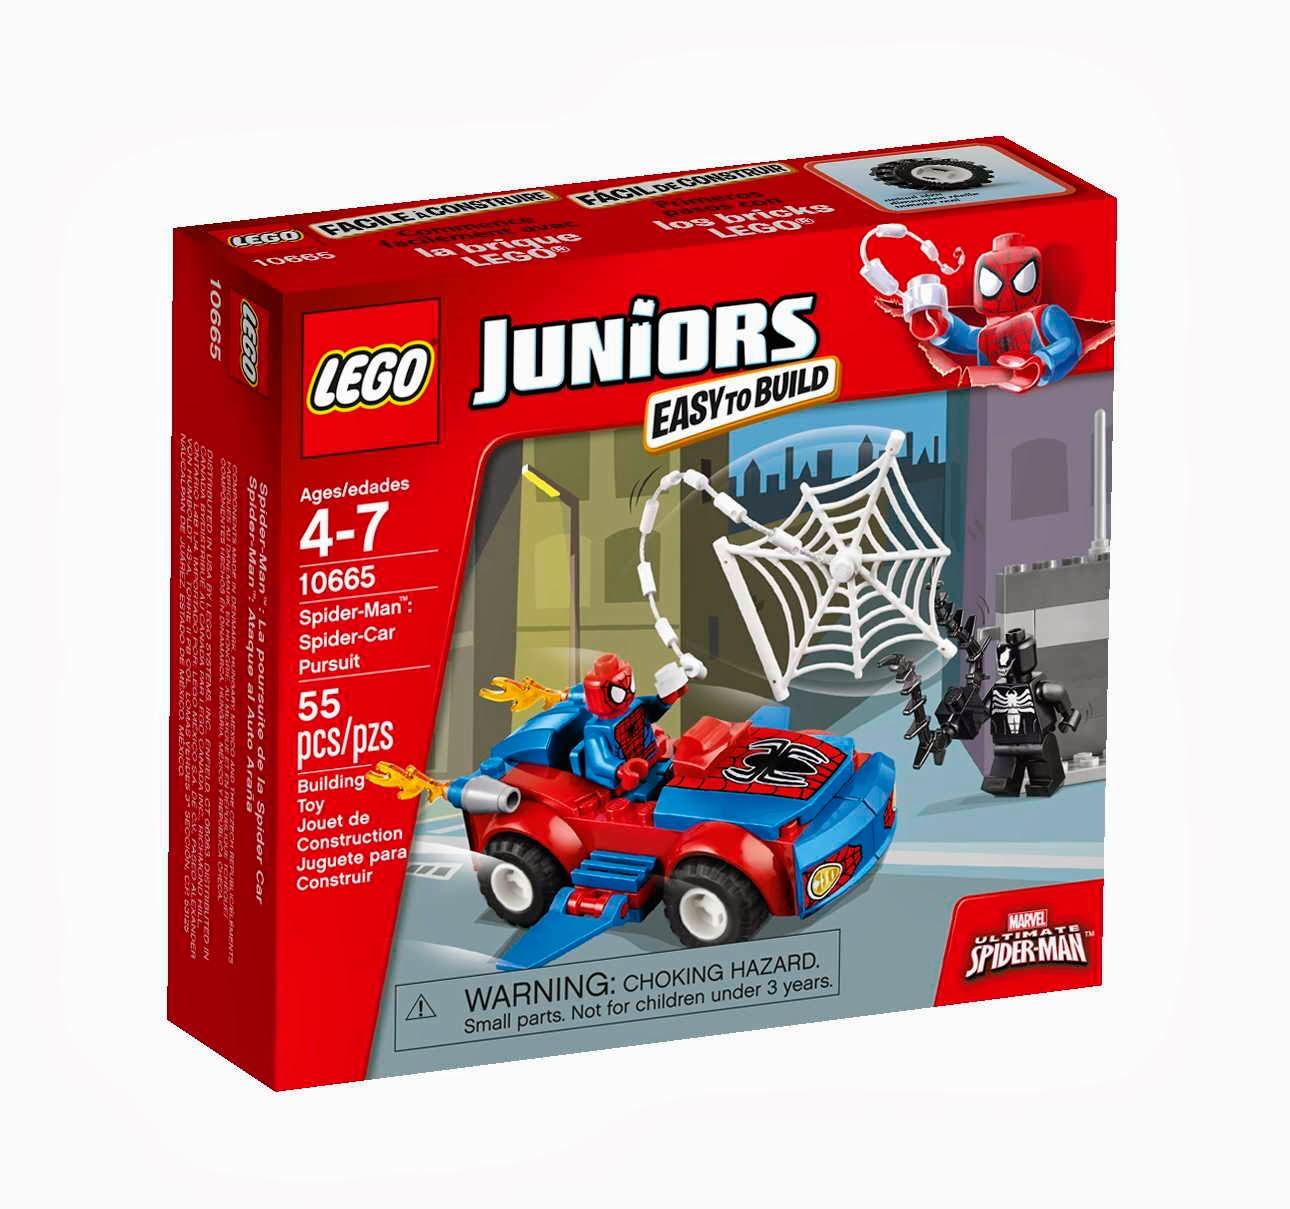 LEGO Juniors 10665 Spidermanovo pronásledovací auto